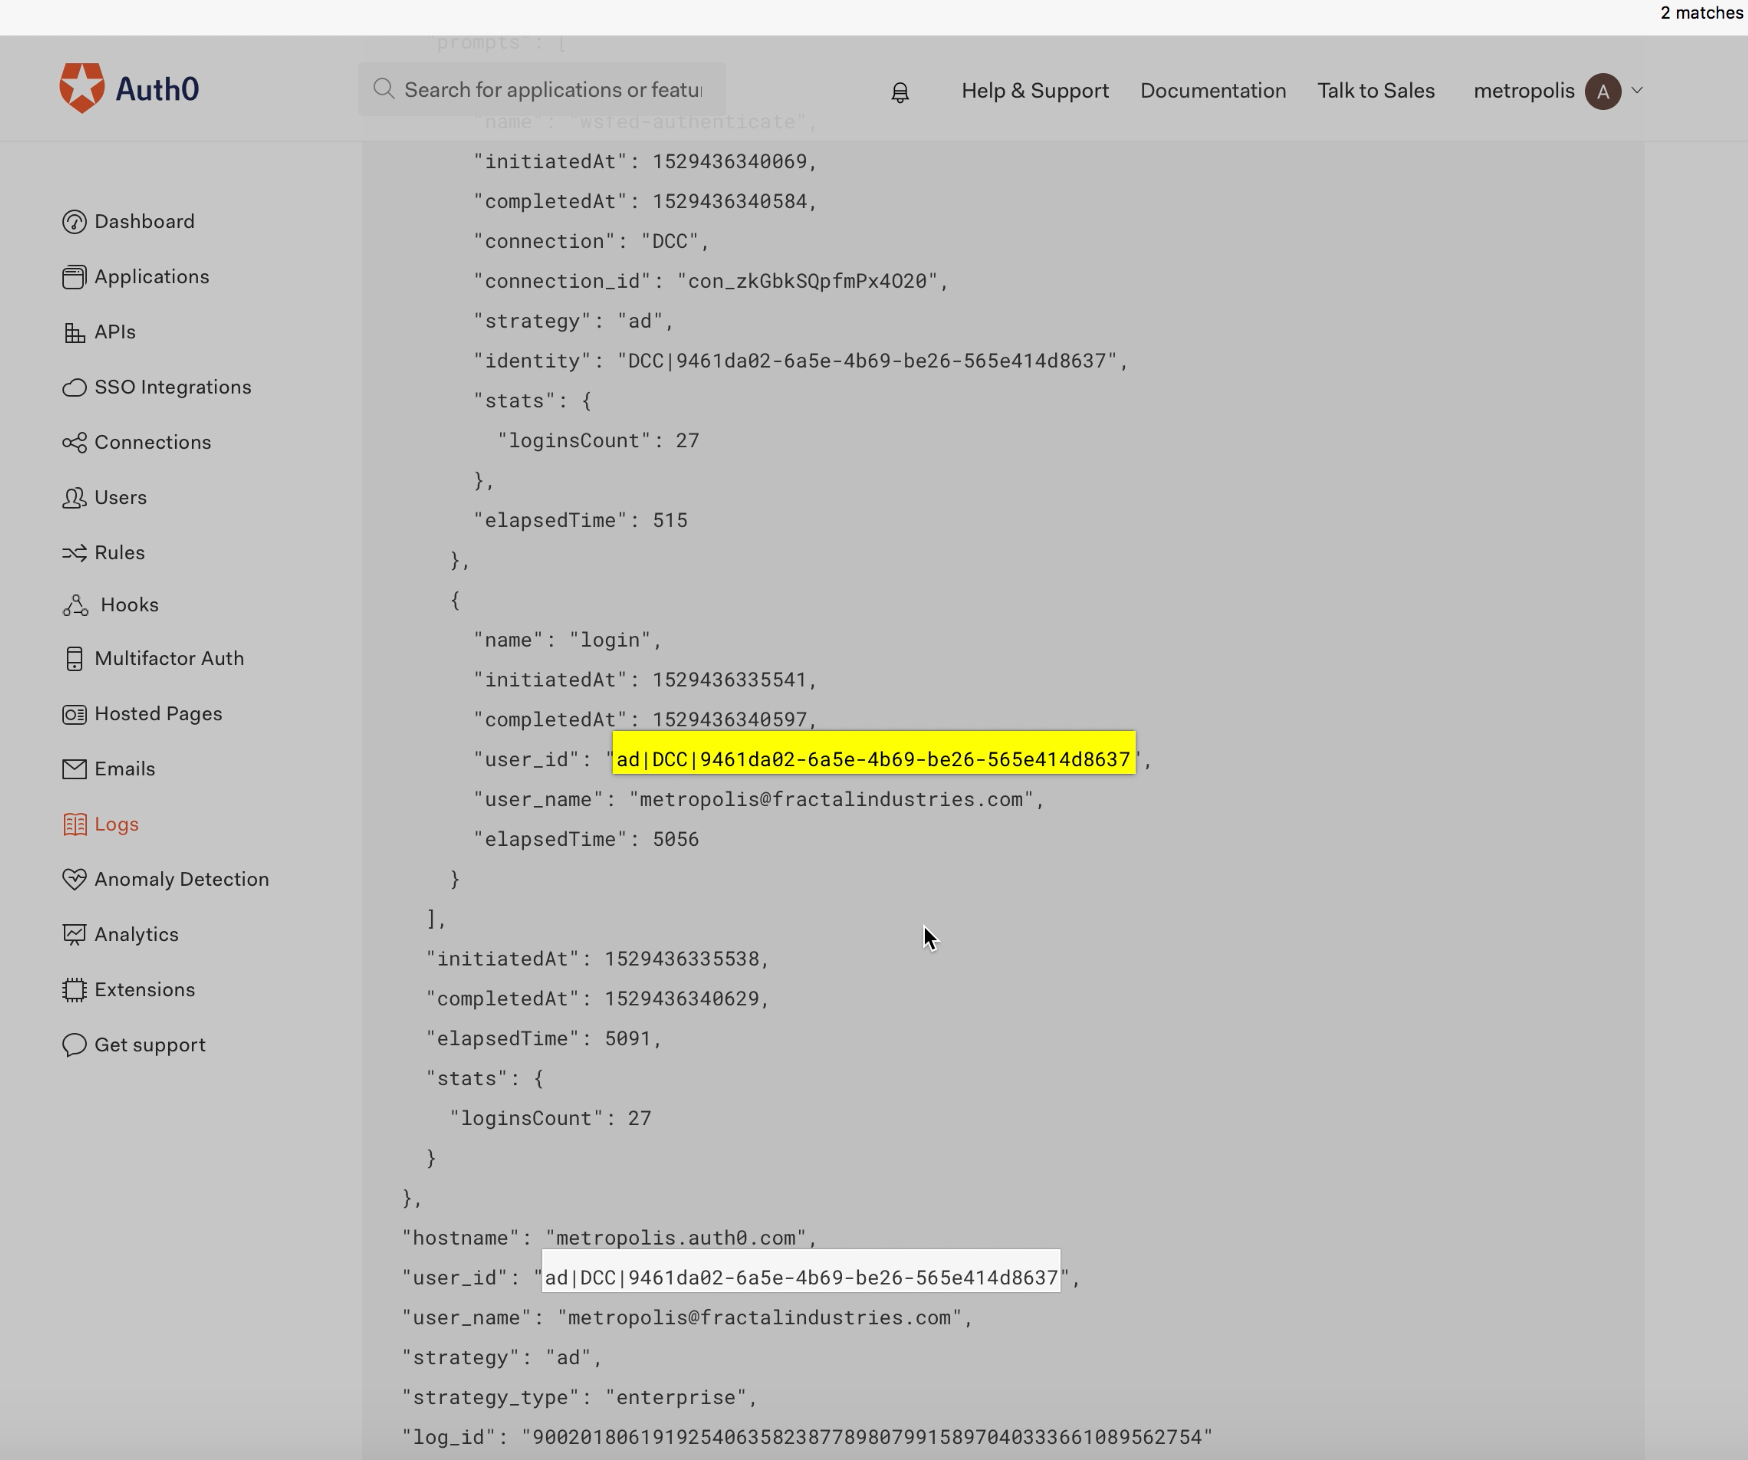 GT attack Auto0 logs logID